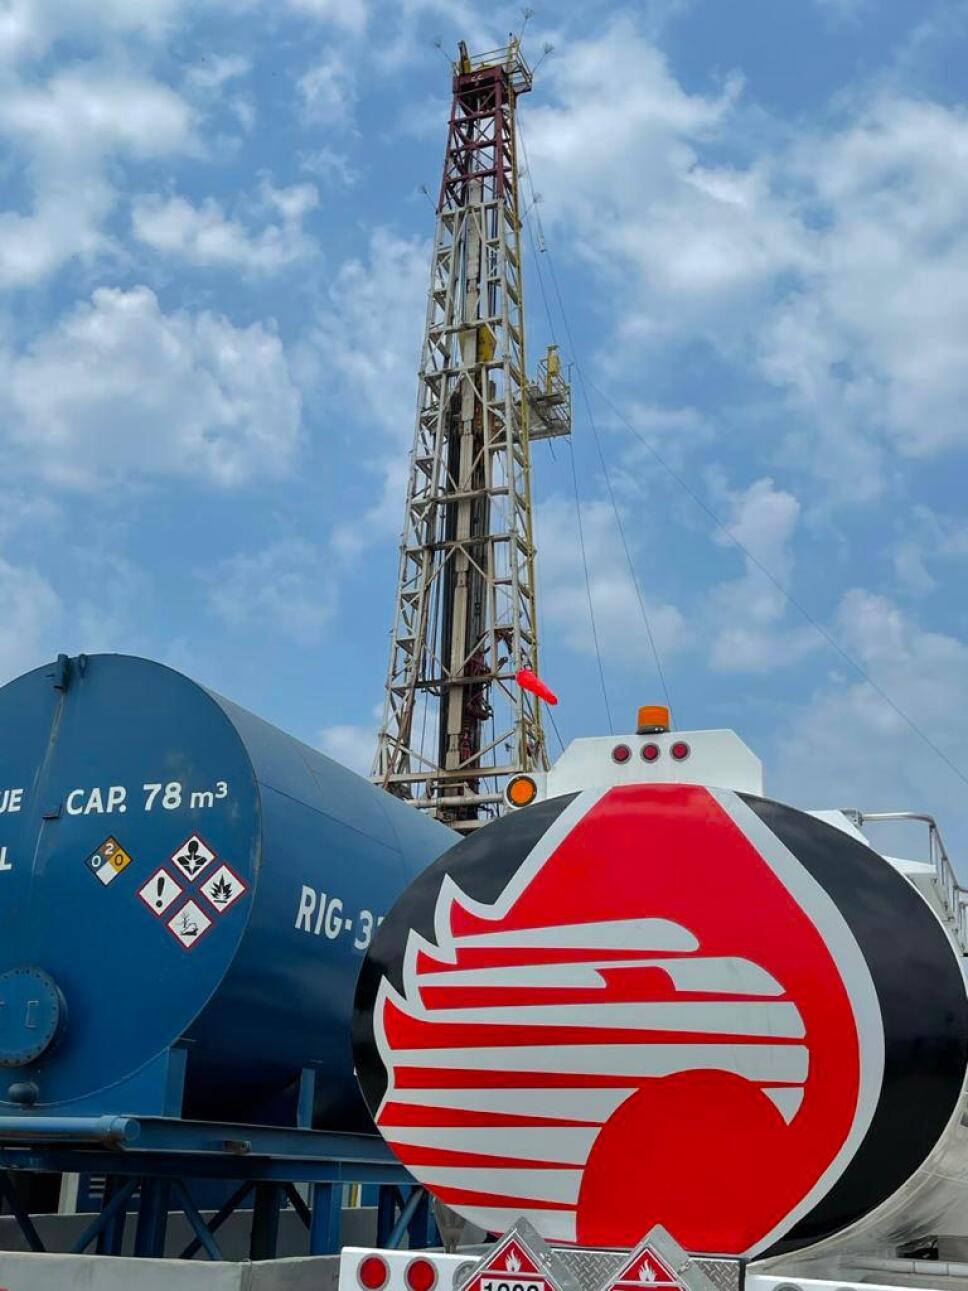 AMLO 83 Aniversario Expropiacion Petrolera 3.jpeg